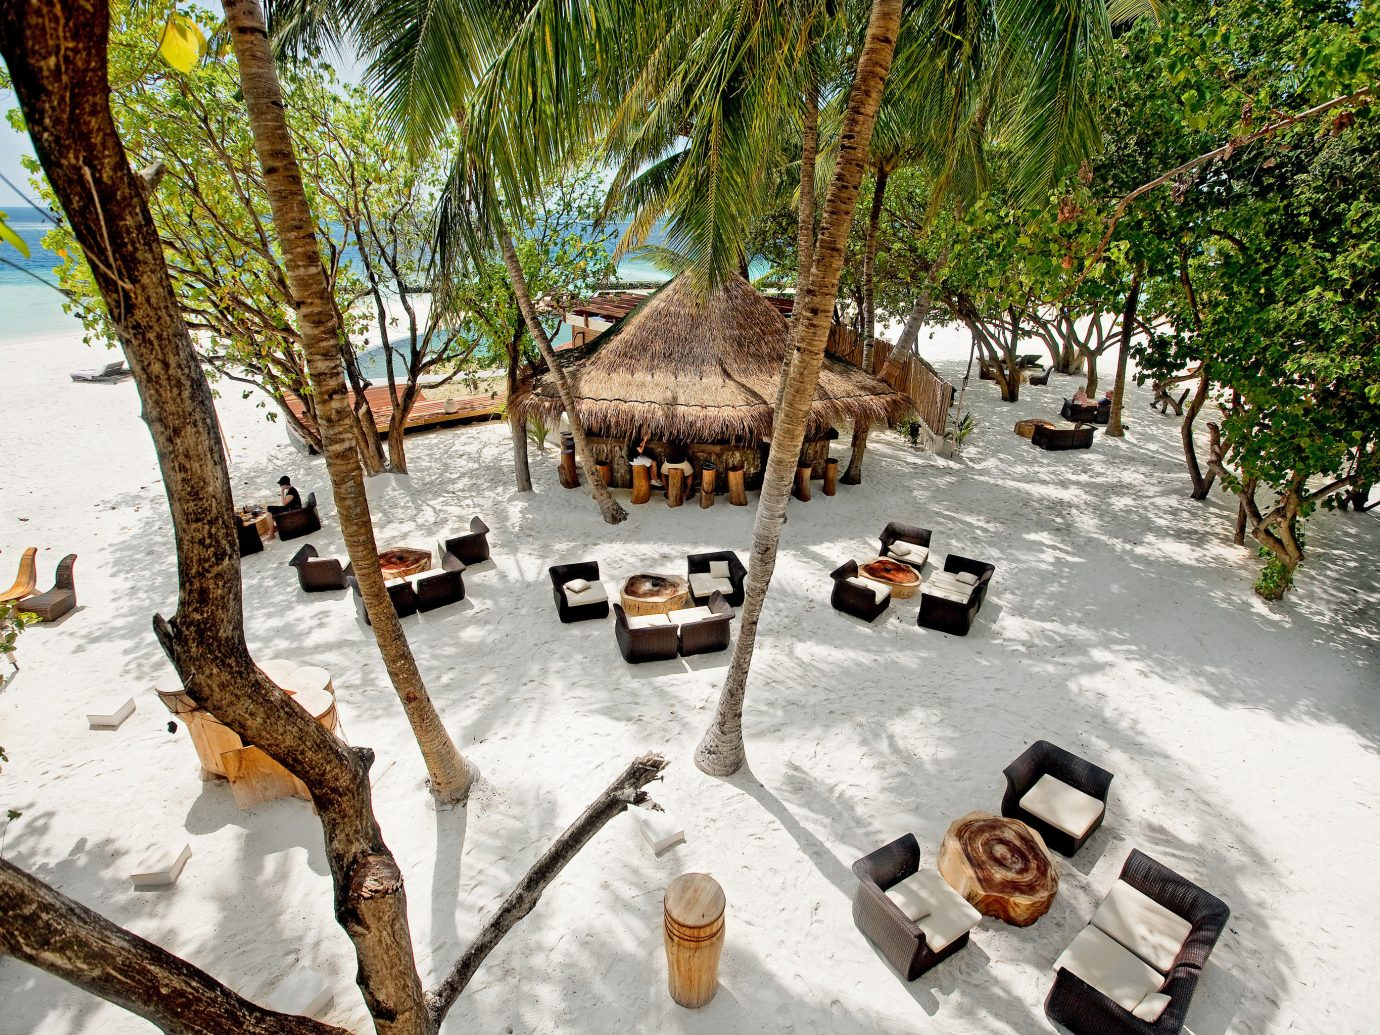 All-Inclusive Resorts Beach Beachfront Dining Grounds Hotels Island Lounge Luxury Luxury Travel Romance Romantic tree outdoor season Resort plant